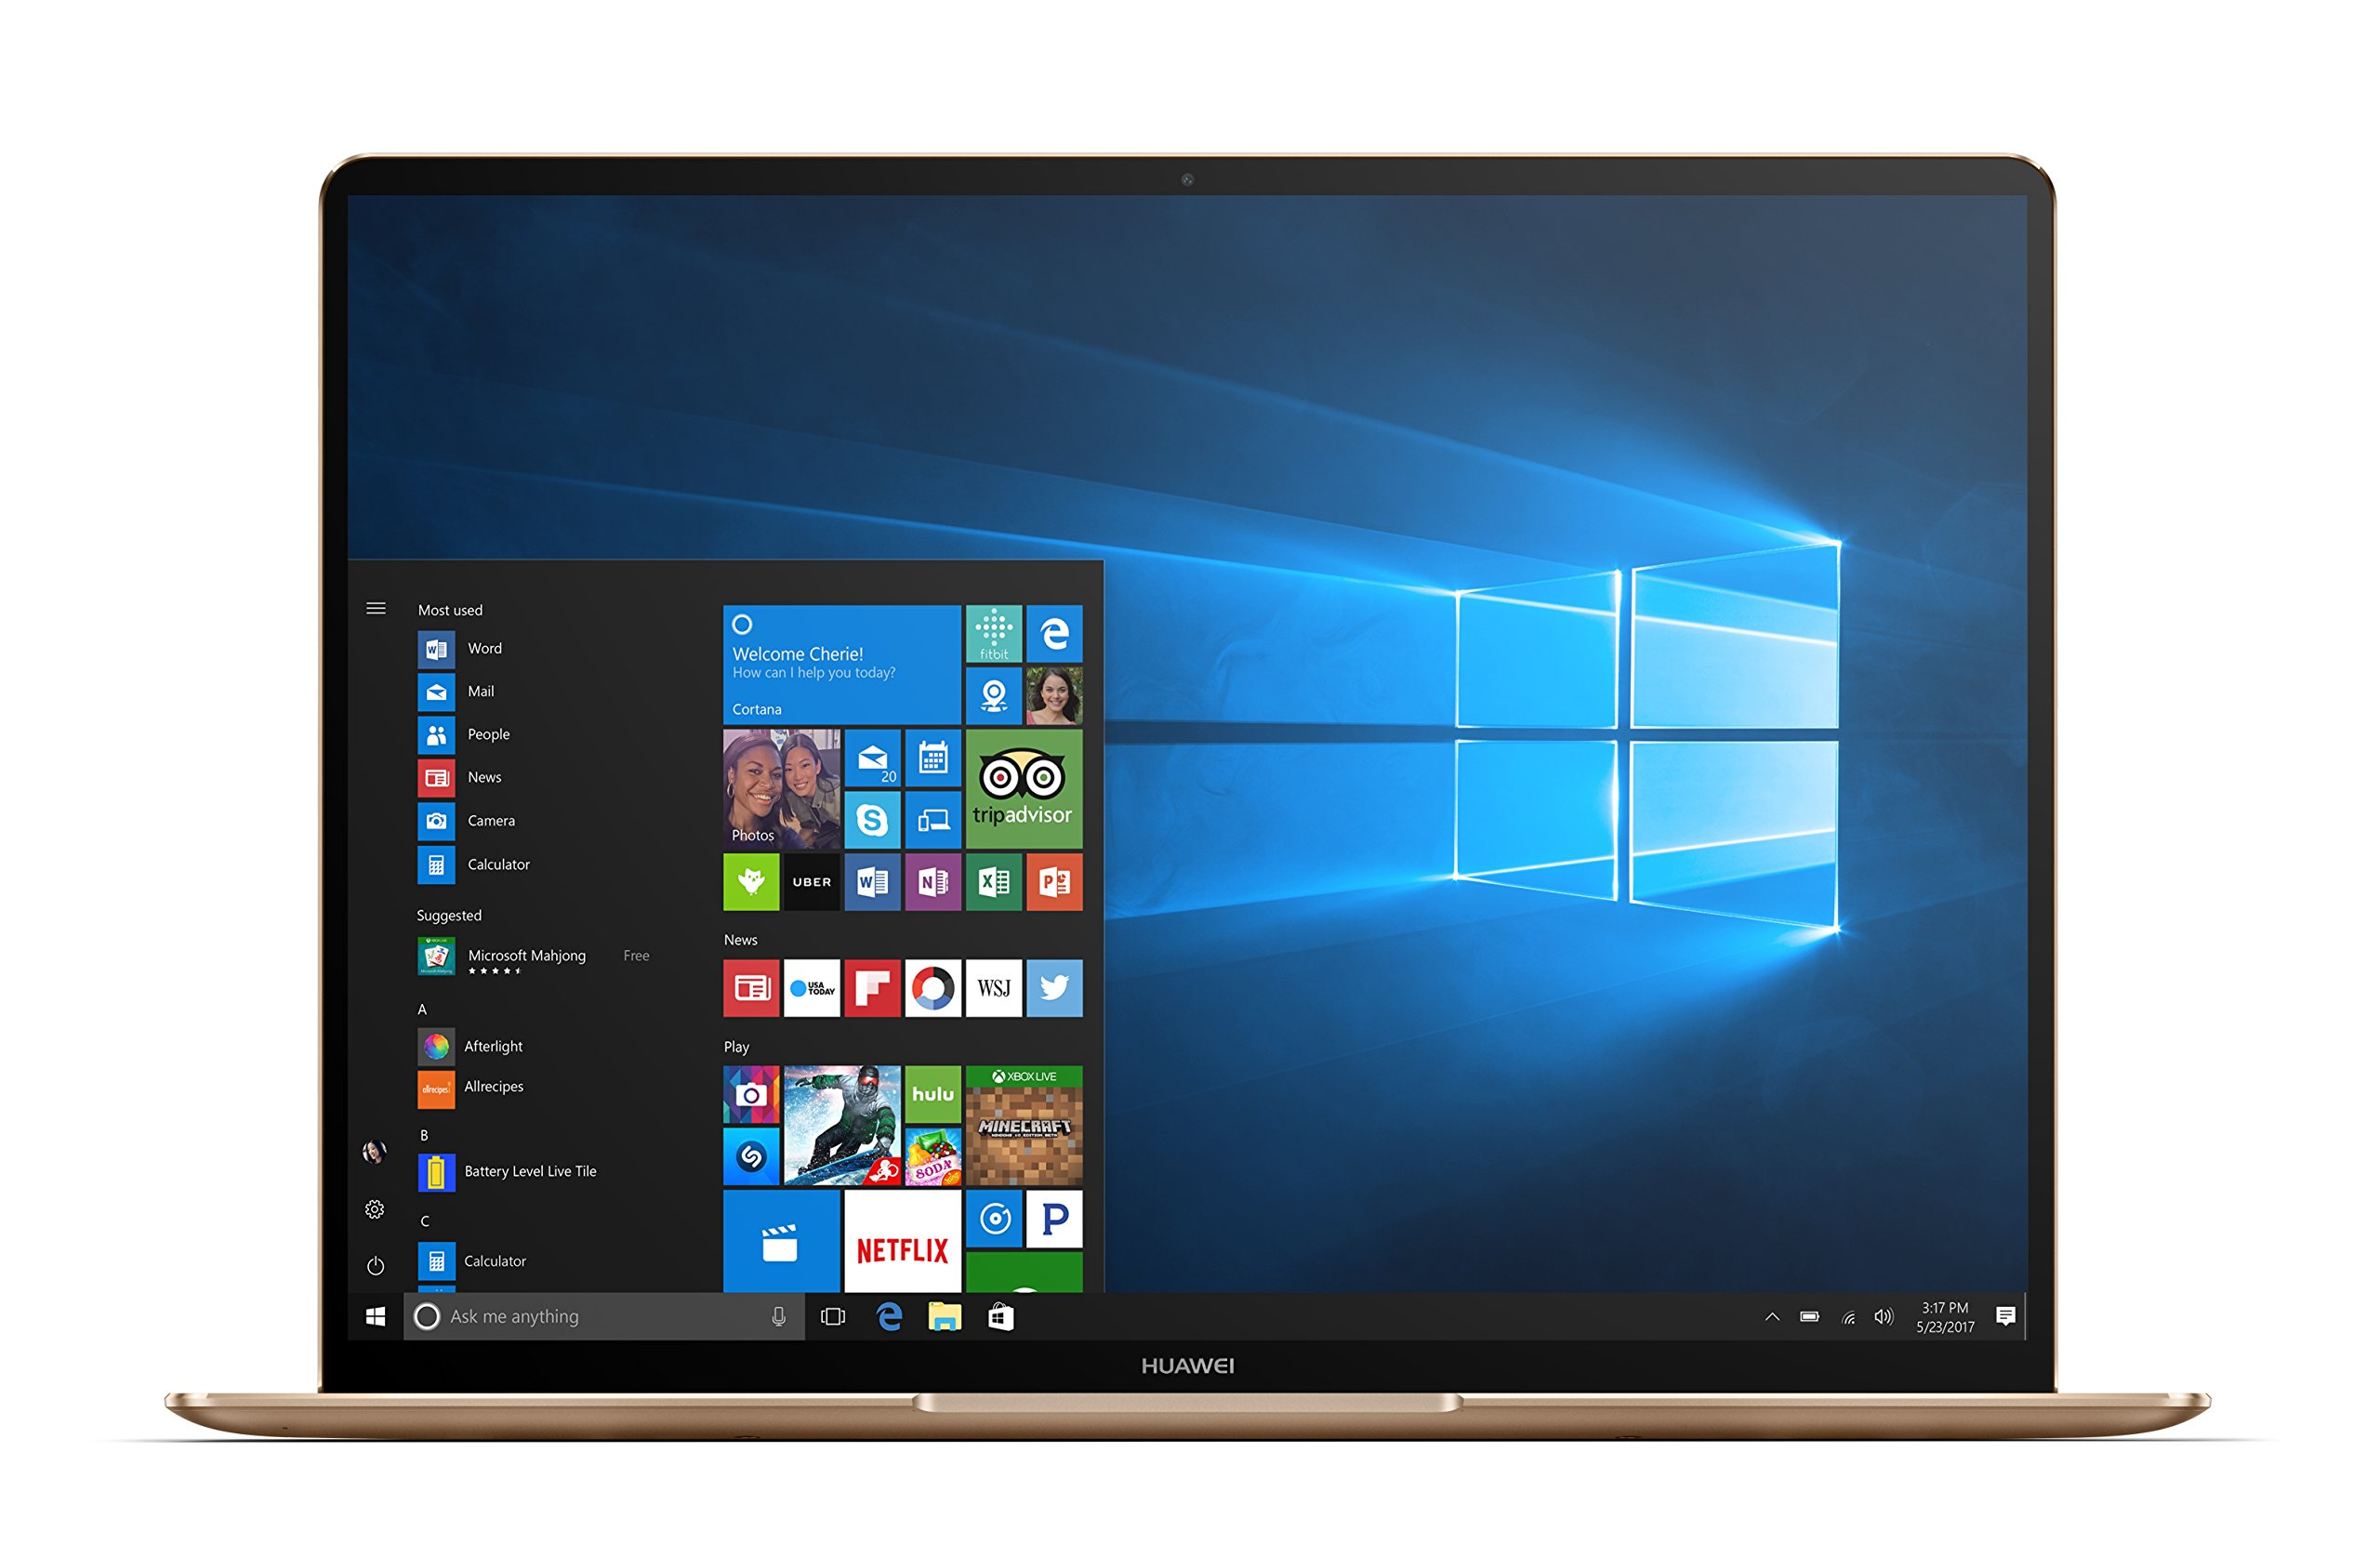 Huawei MateBook X Signature Edition Ultraslim Laptop, 13'' QHD (2K), Intel Core i7-7500U, 8GB RAM, 512GB SSD, Fingerprint, Office 365 Personal, MateDock v2.0, Prestige Gold